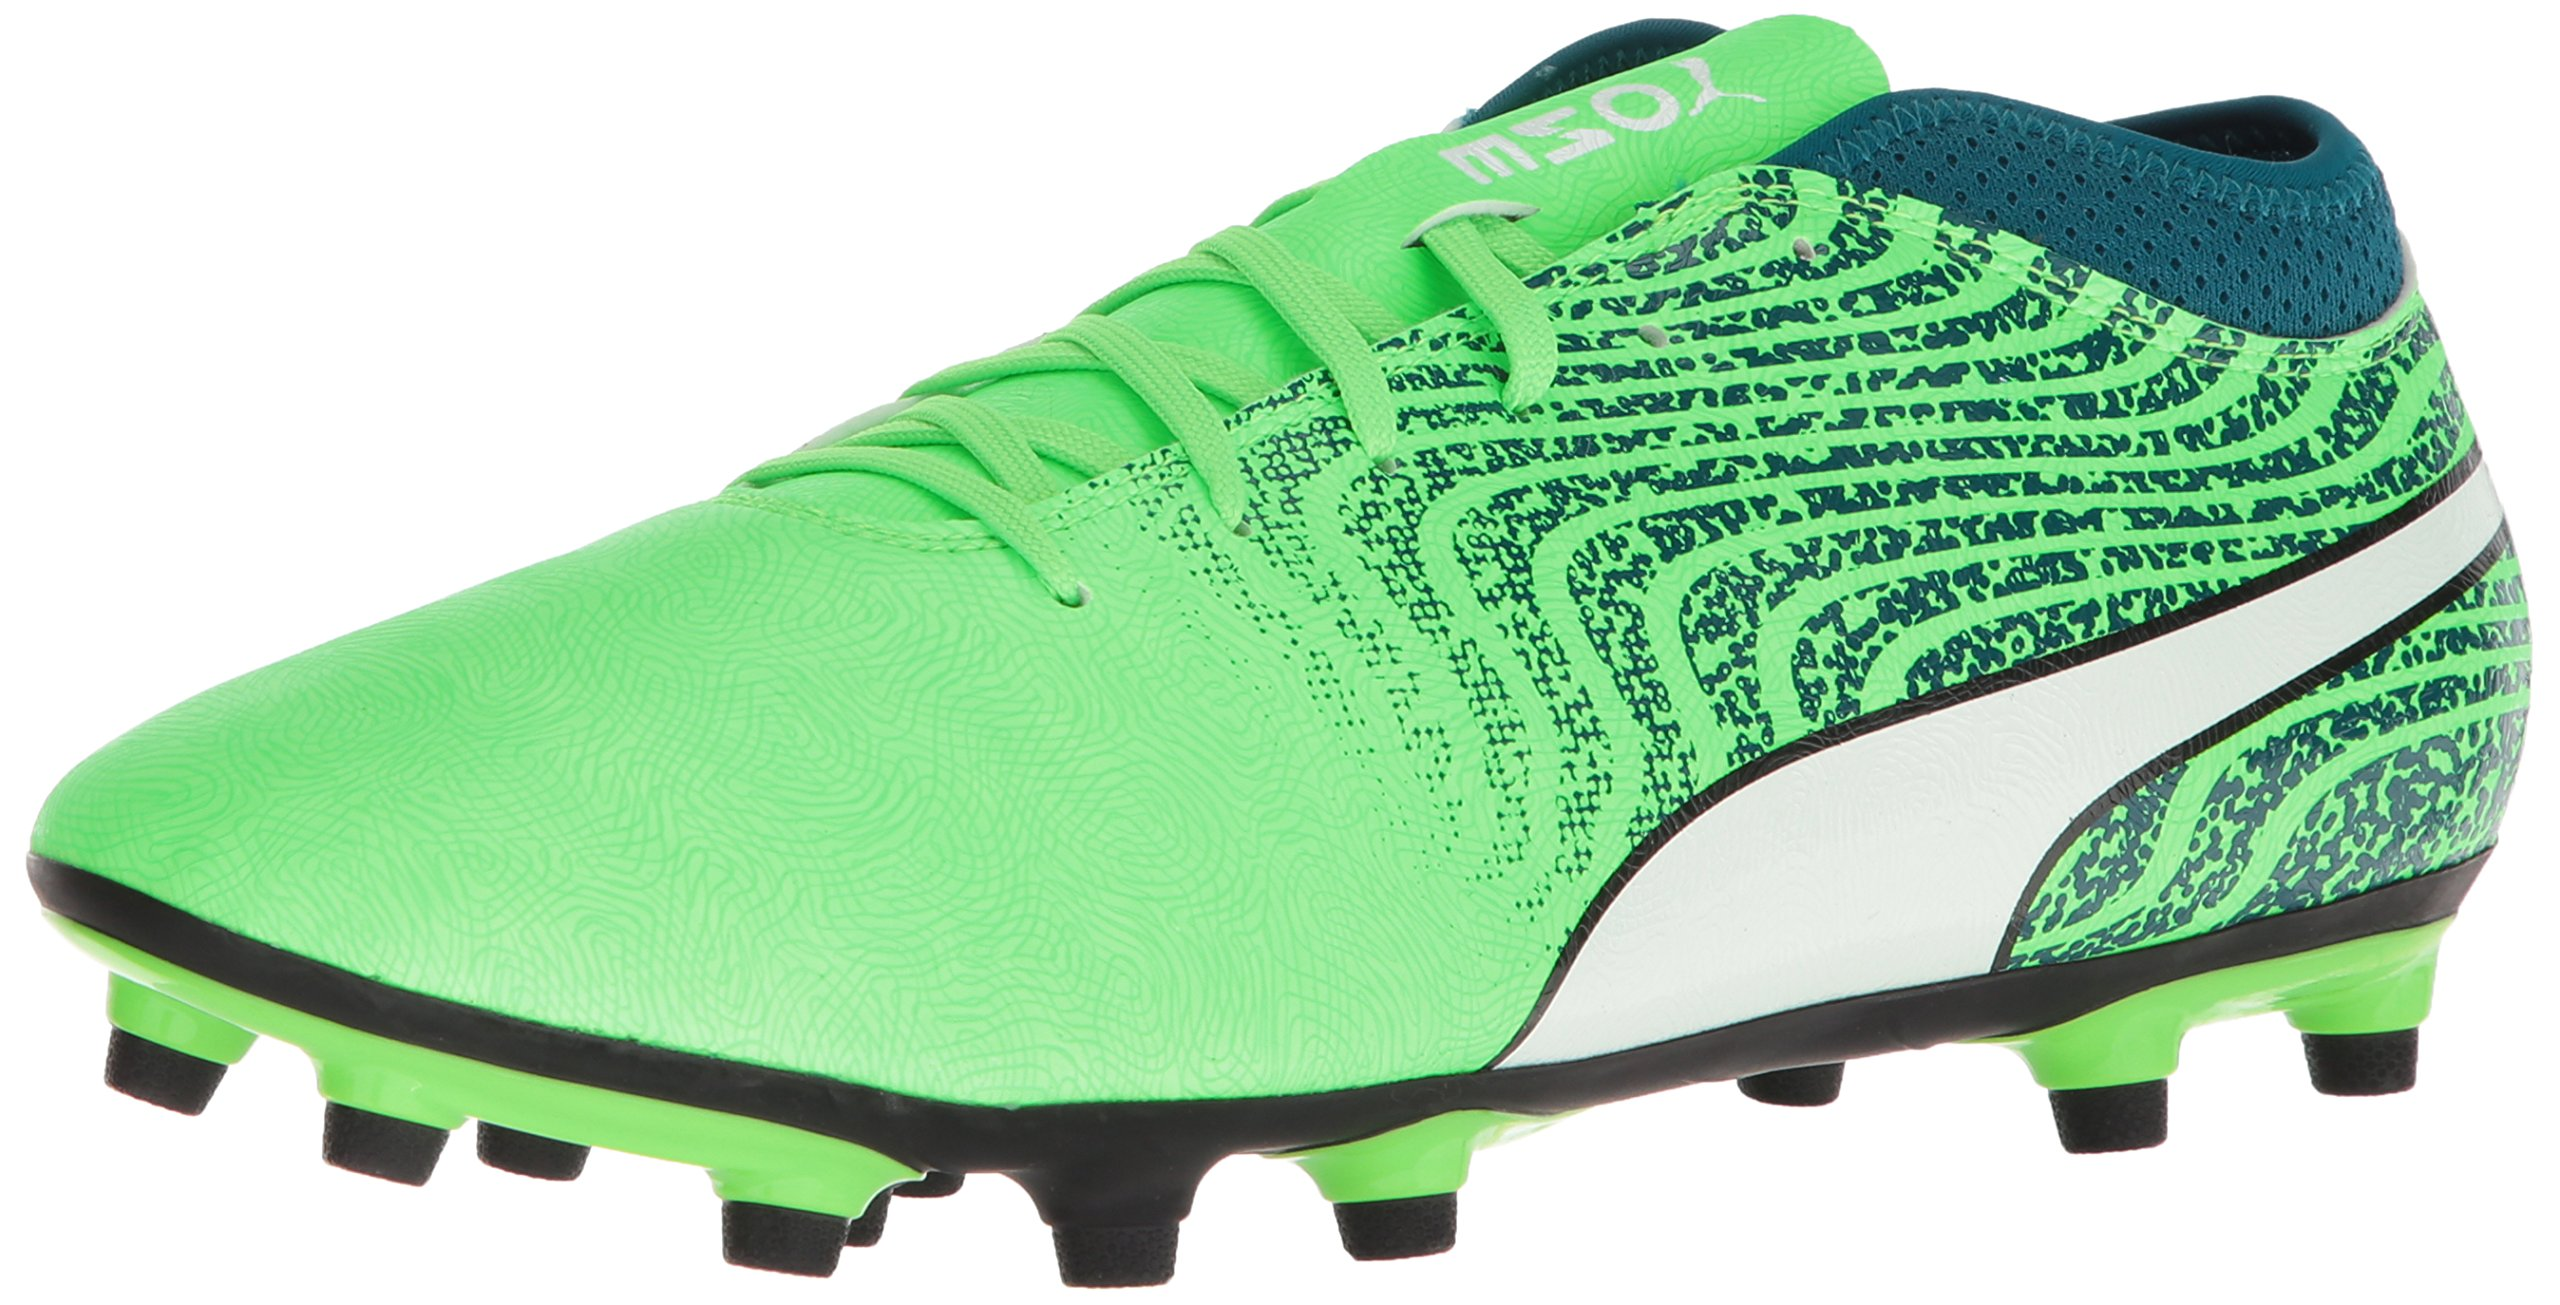 PUMA Men's One 18.4 FG Soccer Shoe, Green Gecko White-Deep Lagoon, 7 M US